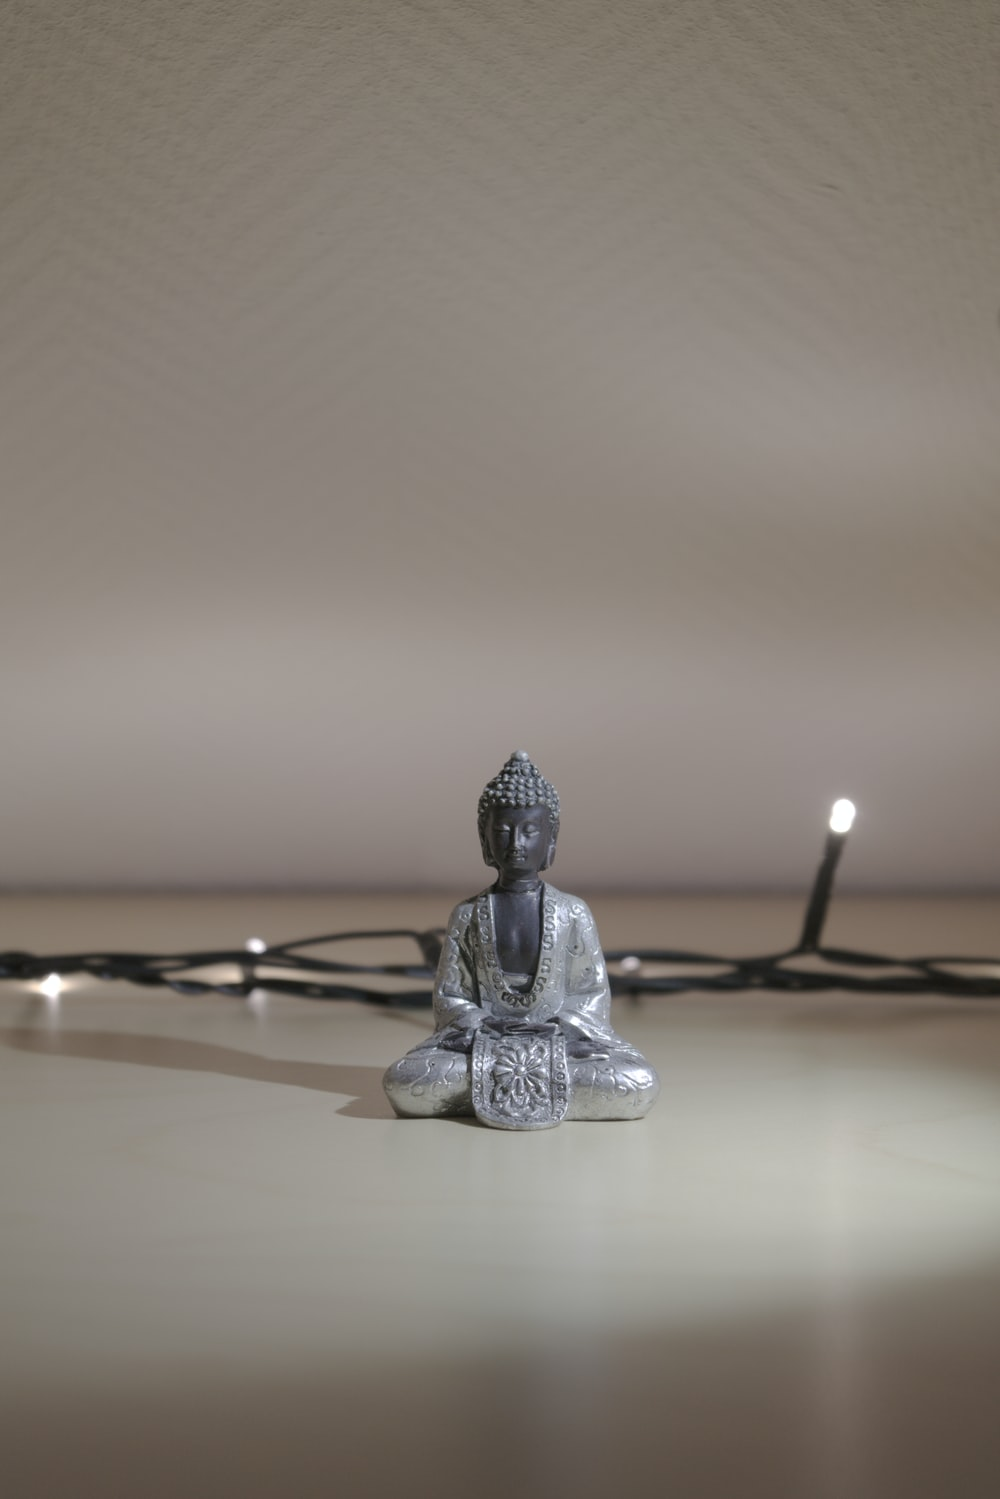 gray buddha figurine]